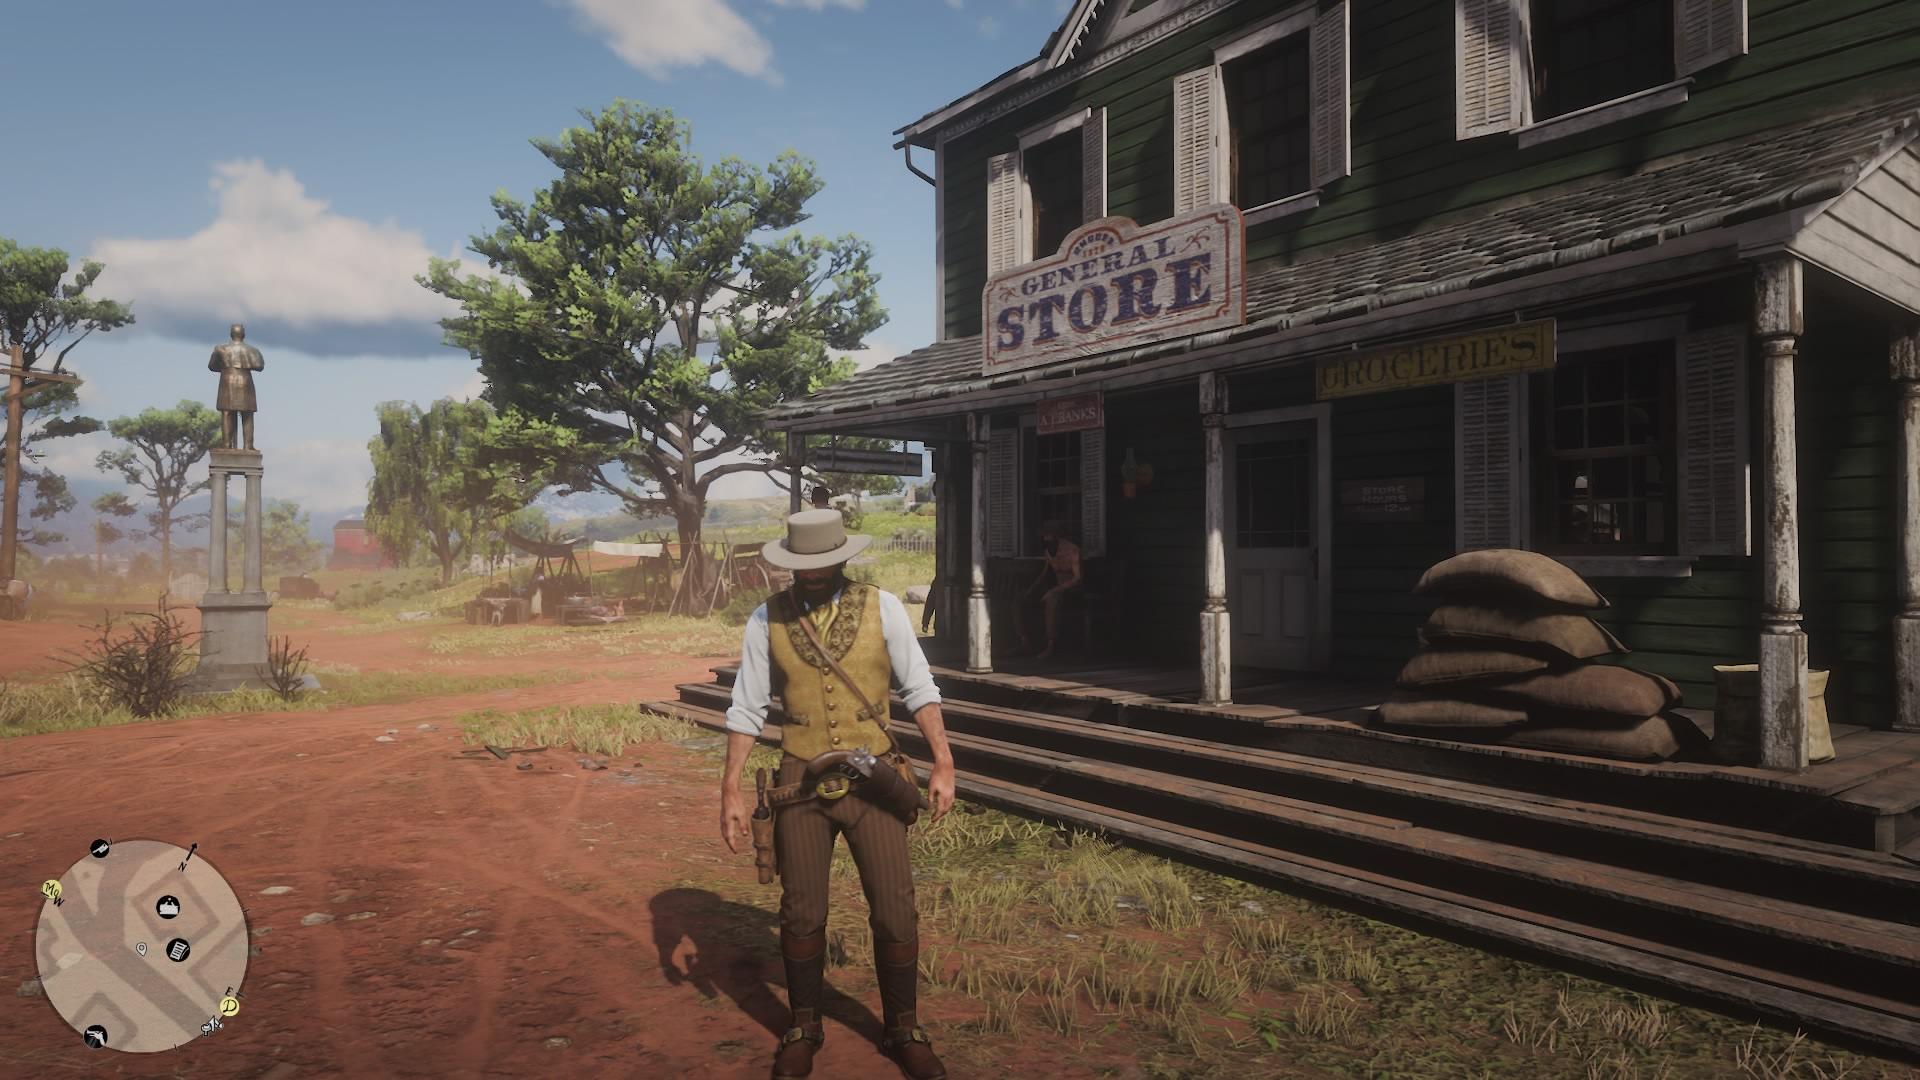 Red Dead Redemption 2_20190314132152.jpg - Red Dead Redemption 2